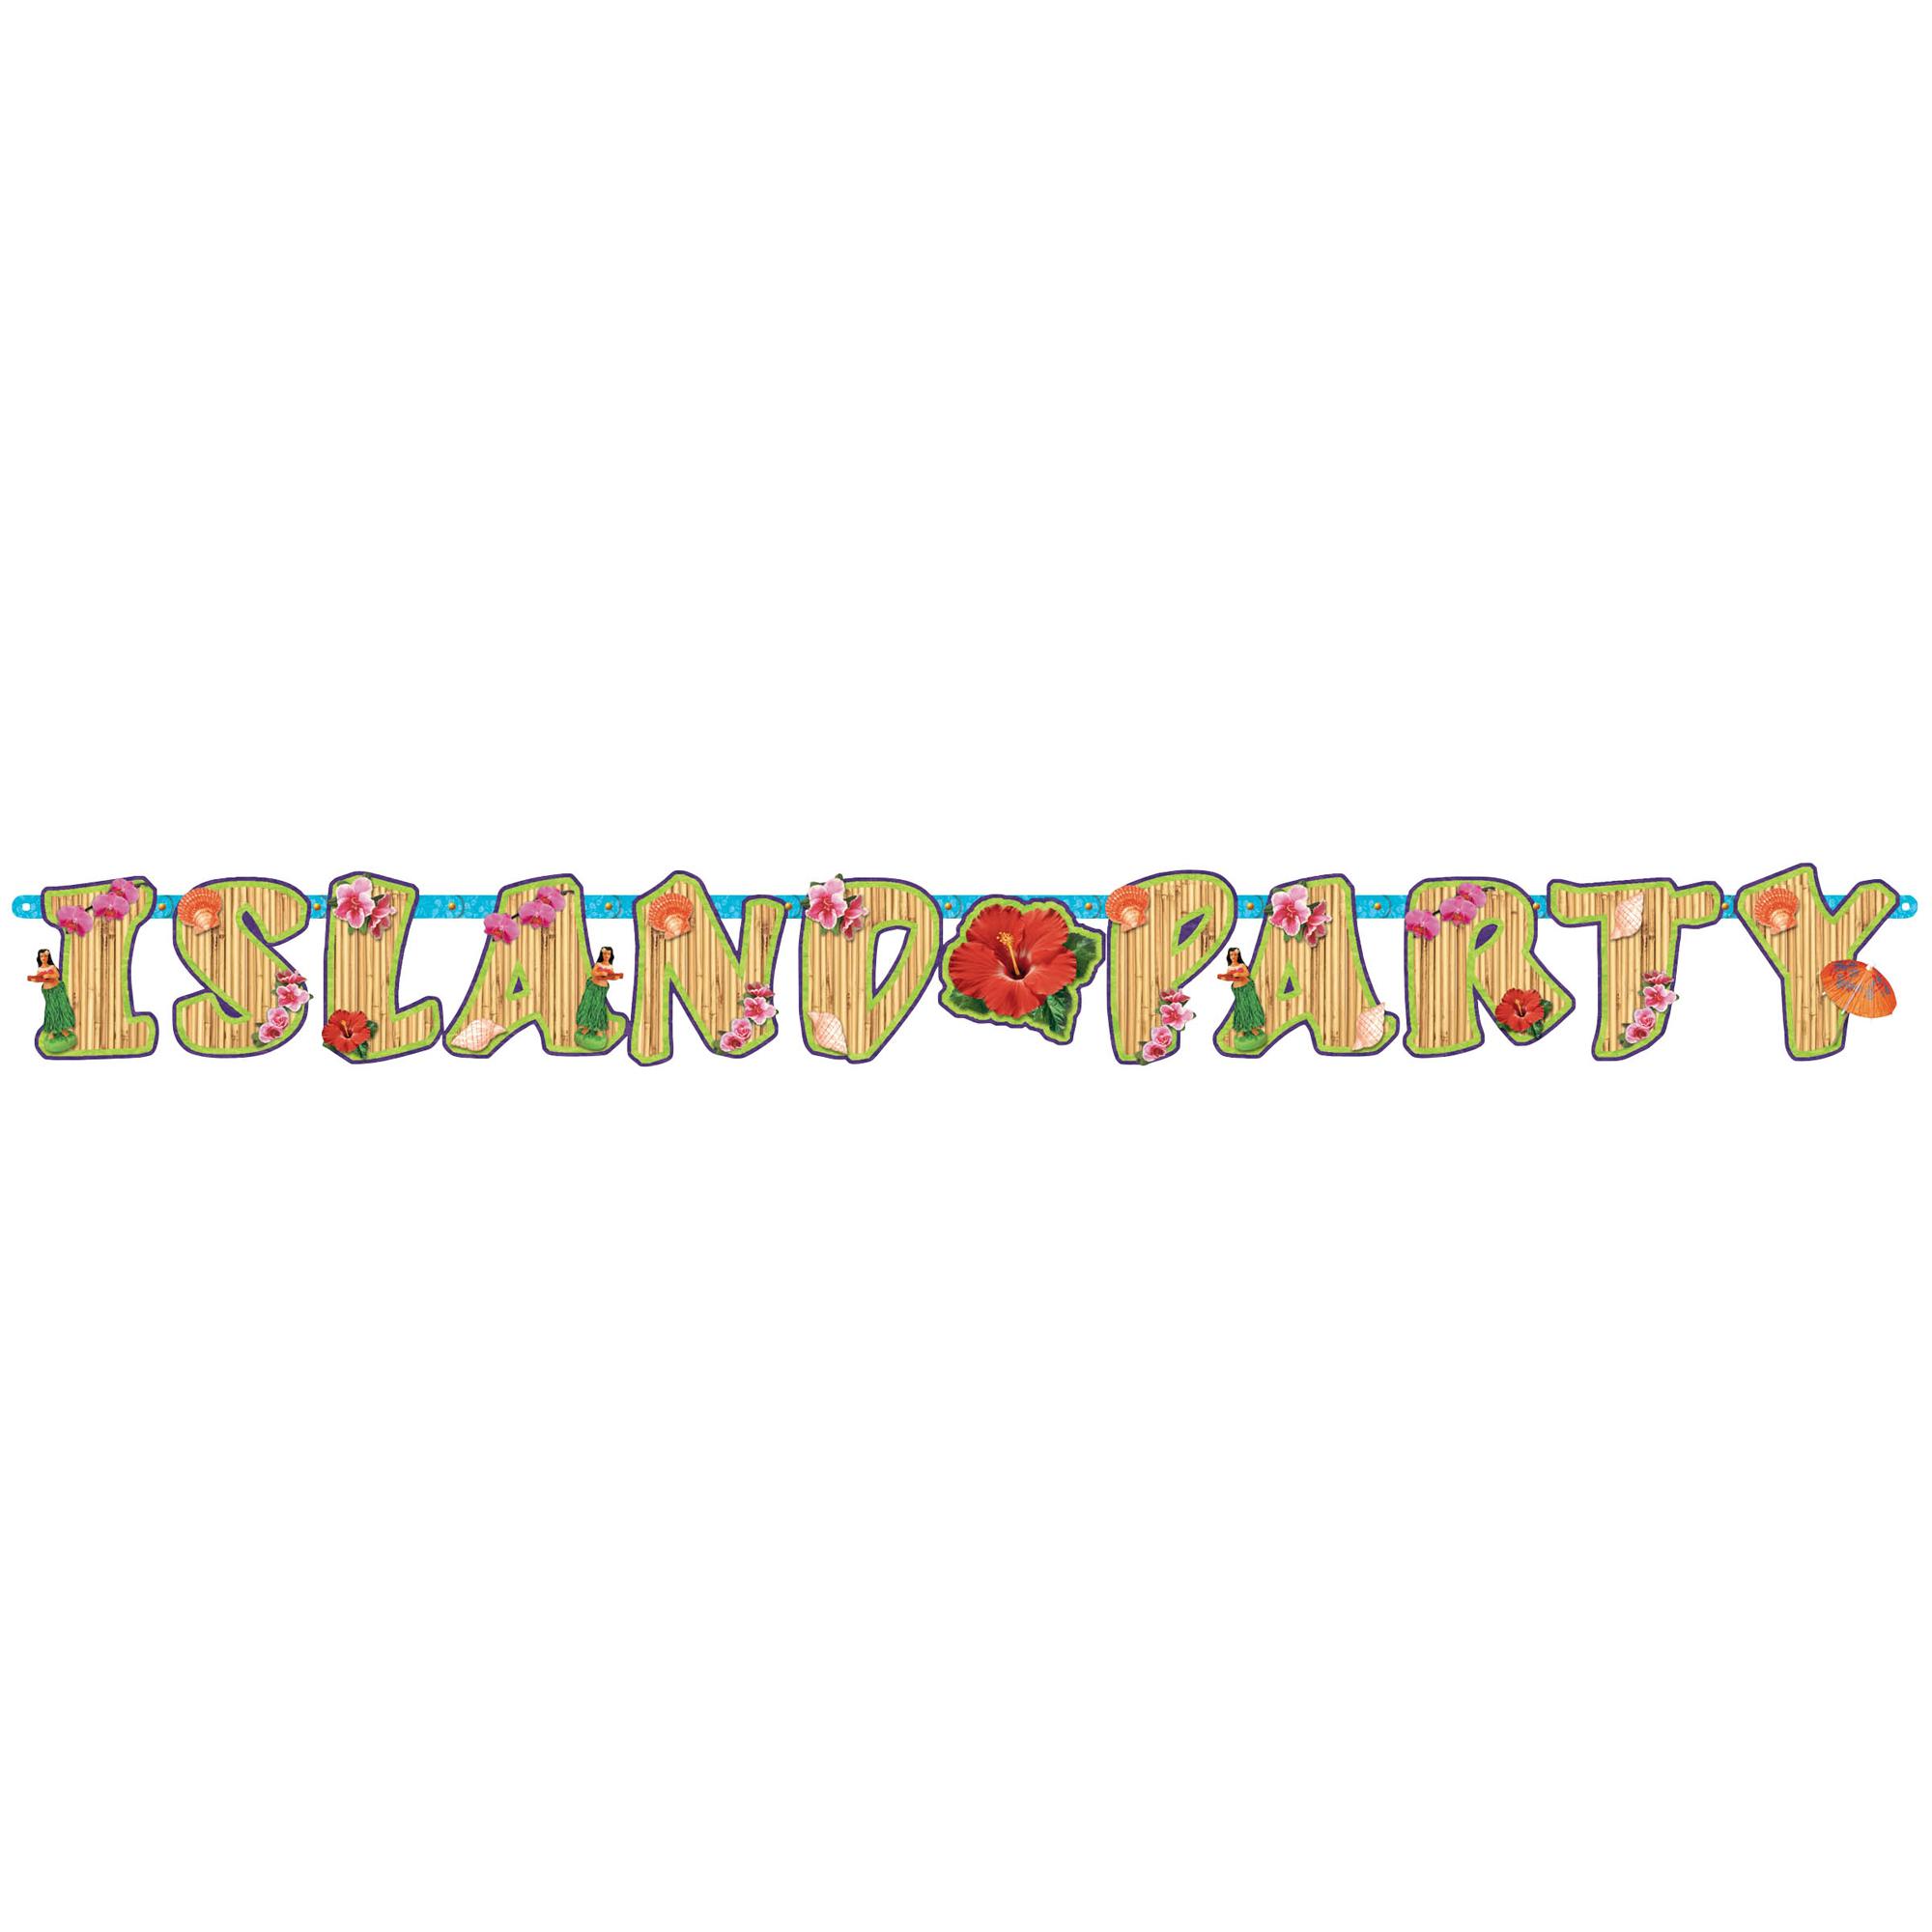 Summer Luau Island Party Cardboard Letter Banner